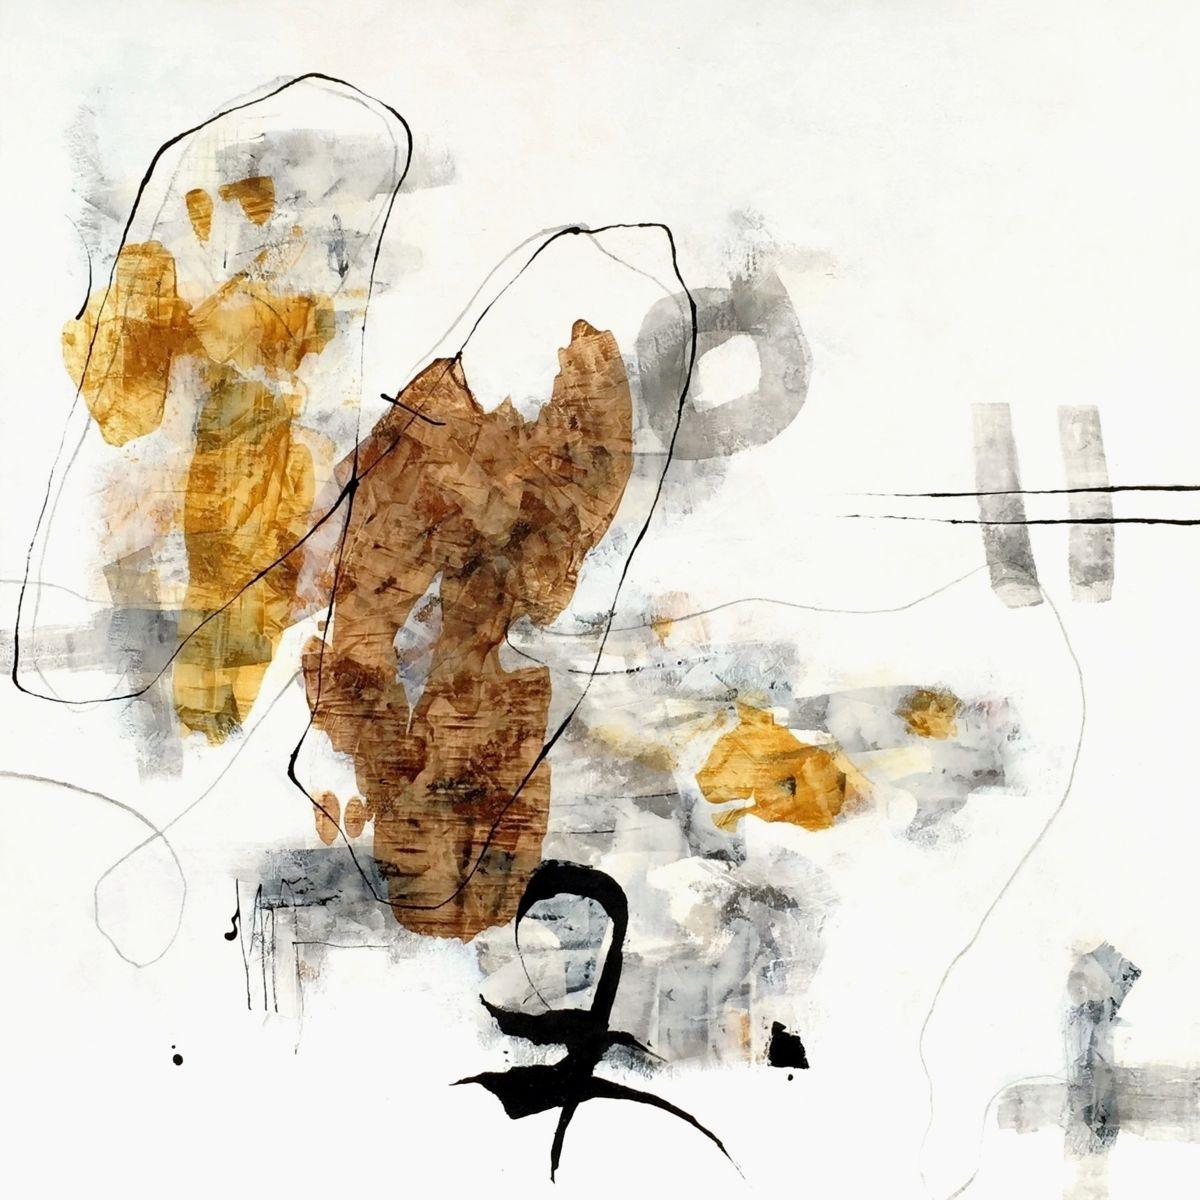 art, abstrait, exposition, Roissy-en-France, Val d'Oise, peinture